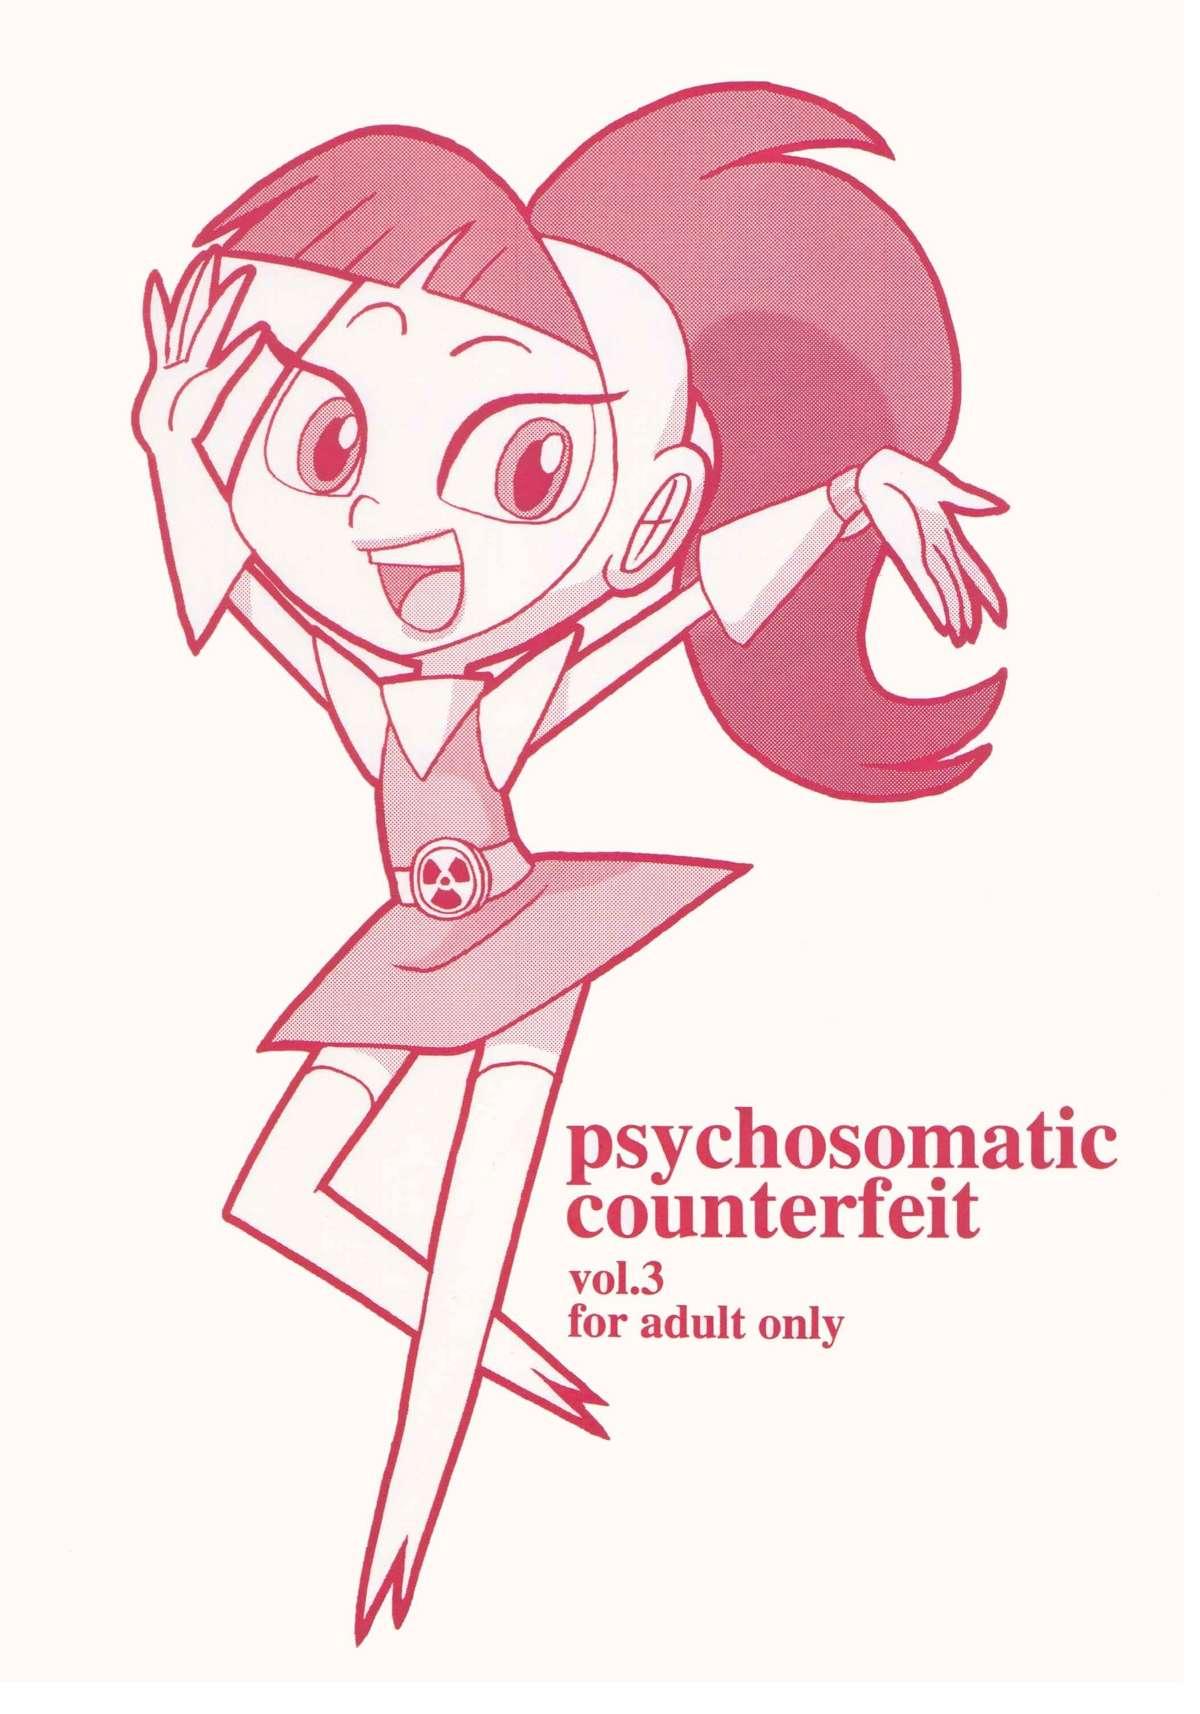 SureFap xxx porno Atomic Betty - [Union Of The Snake (Shinda Mane)] - Psychosomatic Counterfeit Ex Atomic Betty Vol. 3